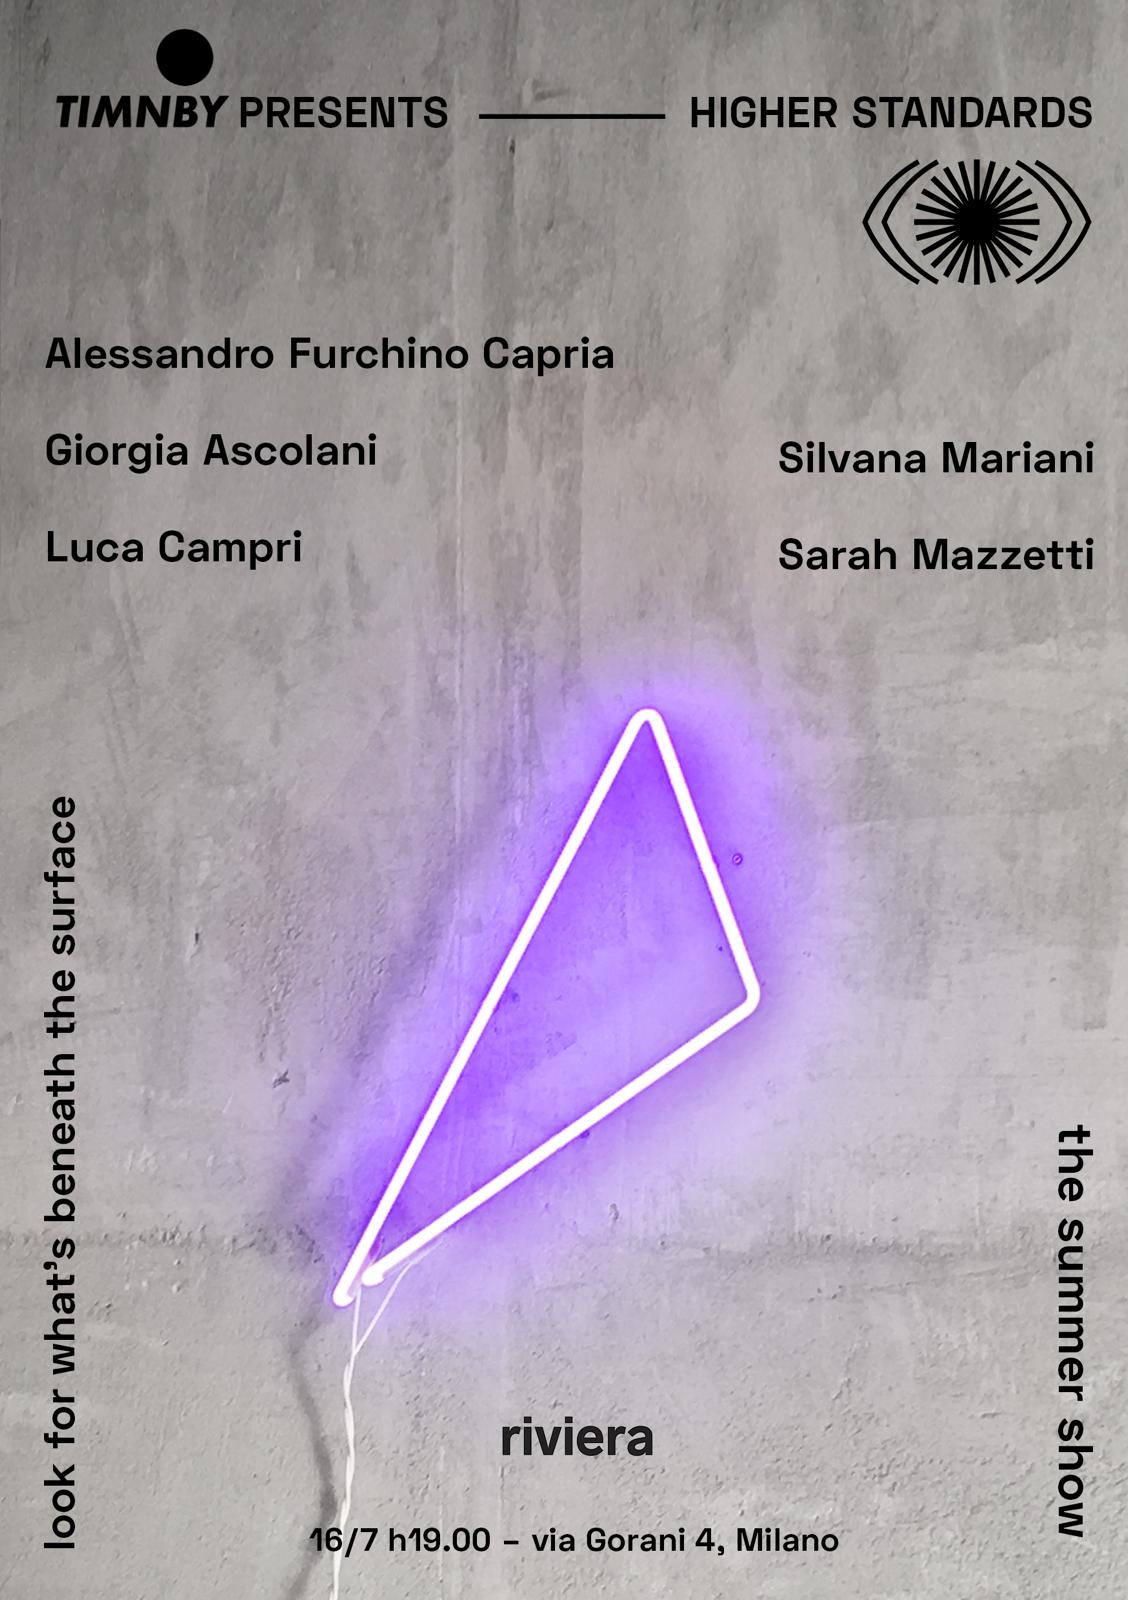 TIMNBY Summer 2019 SHOW in Milan